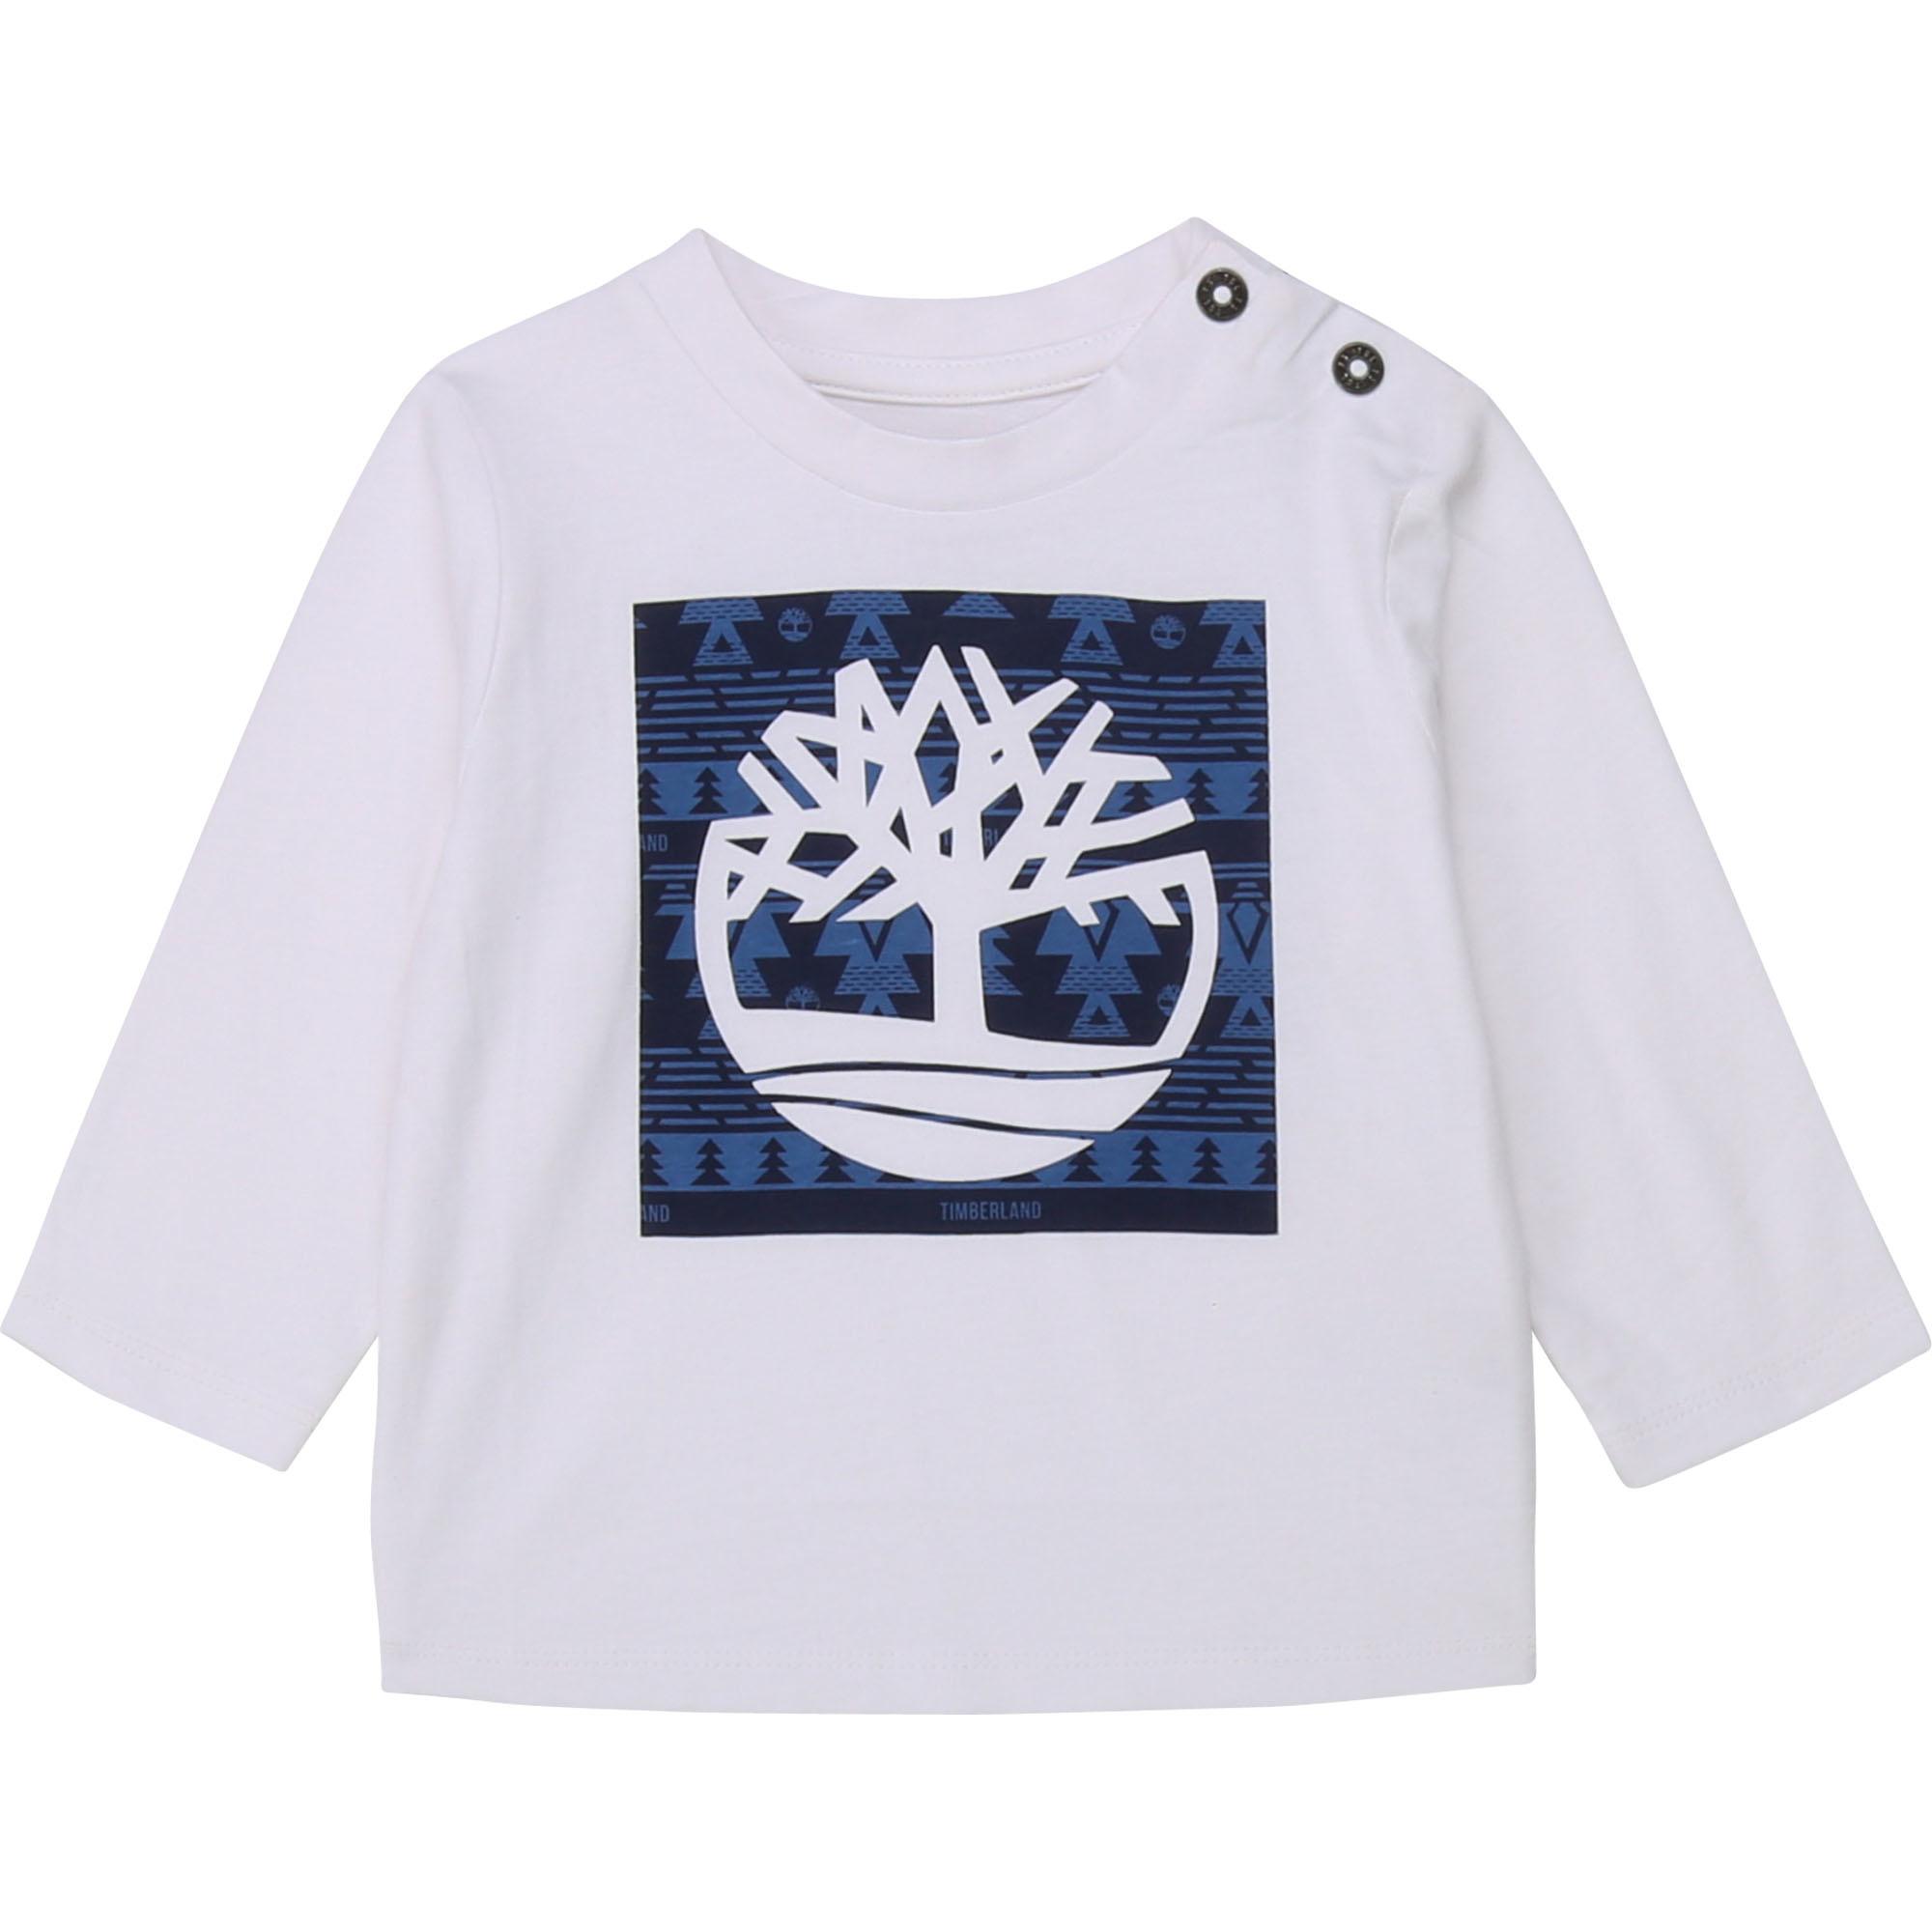 TIMBERLAND t-shirt jersey manches longues-1